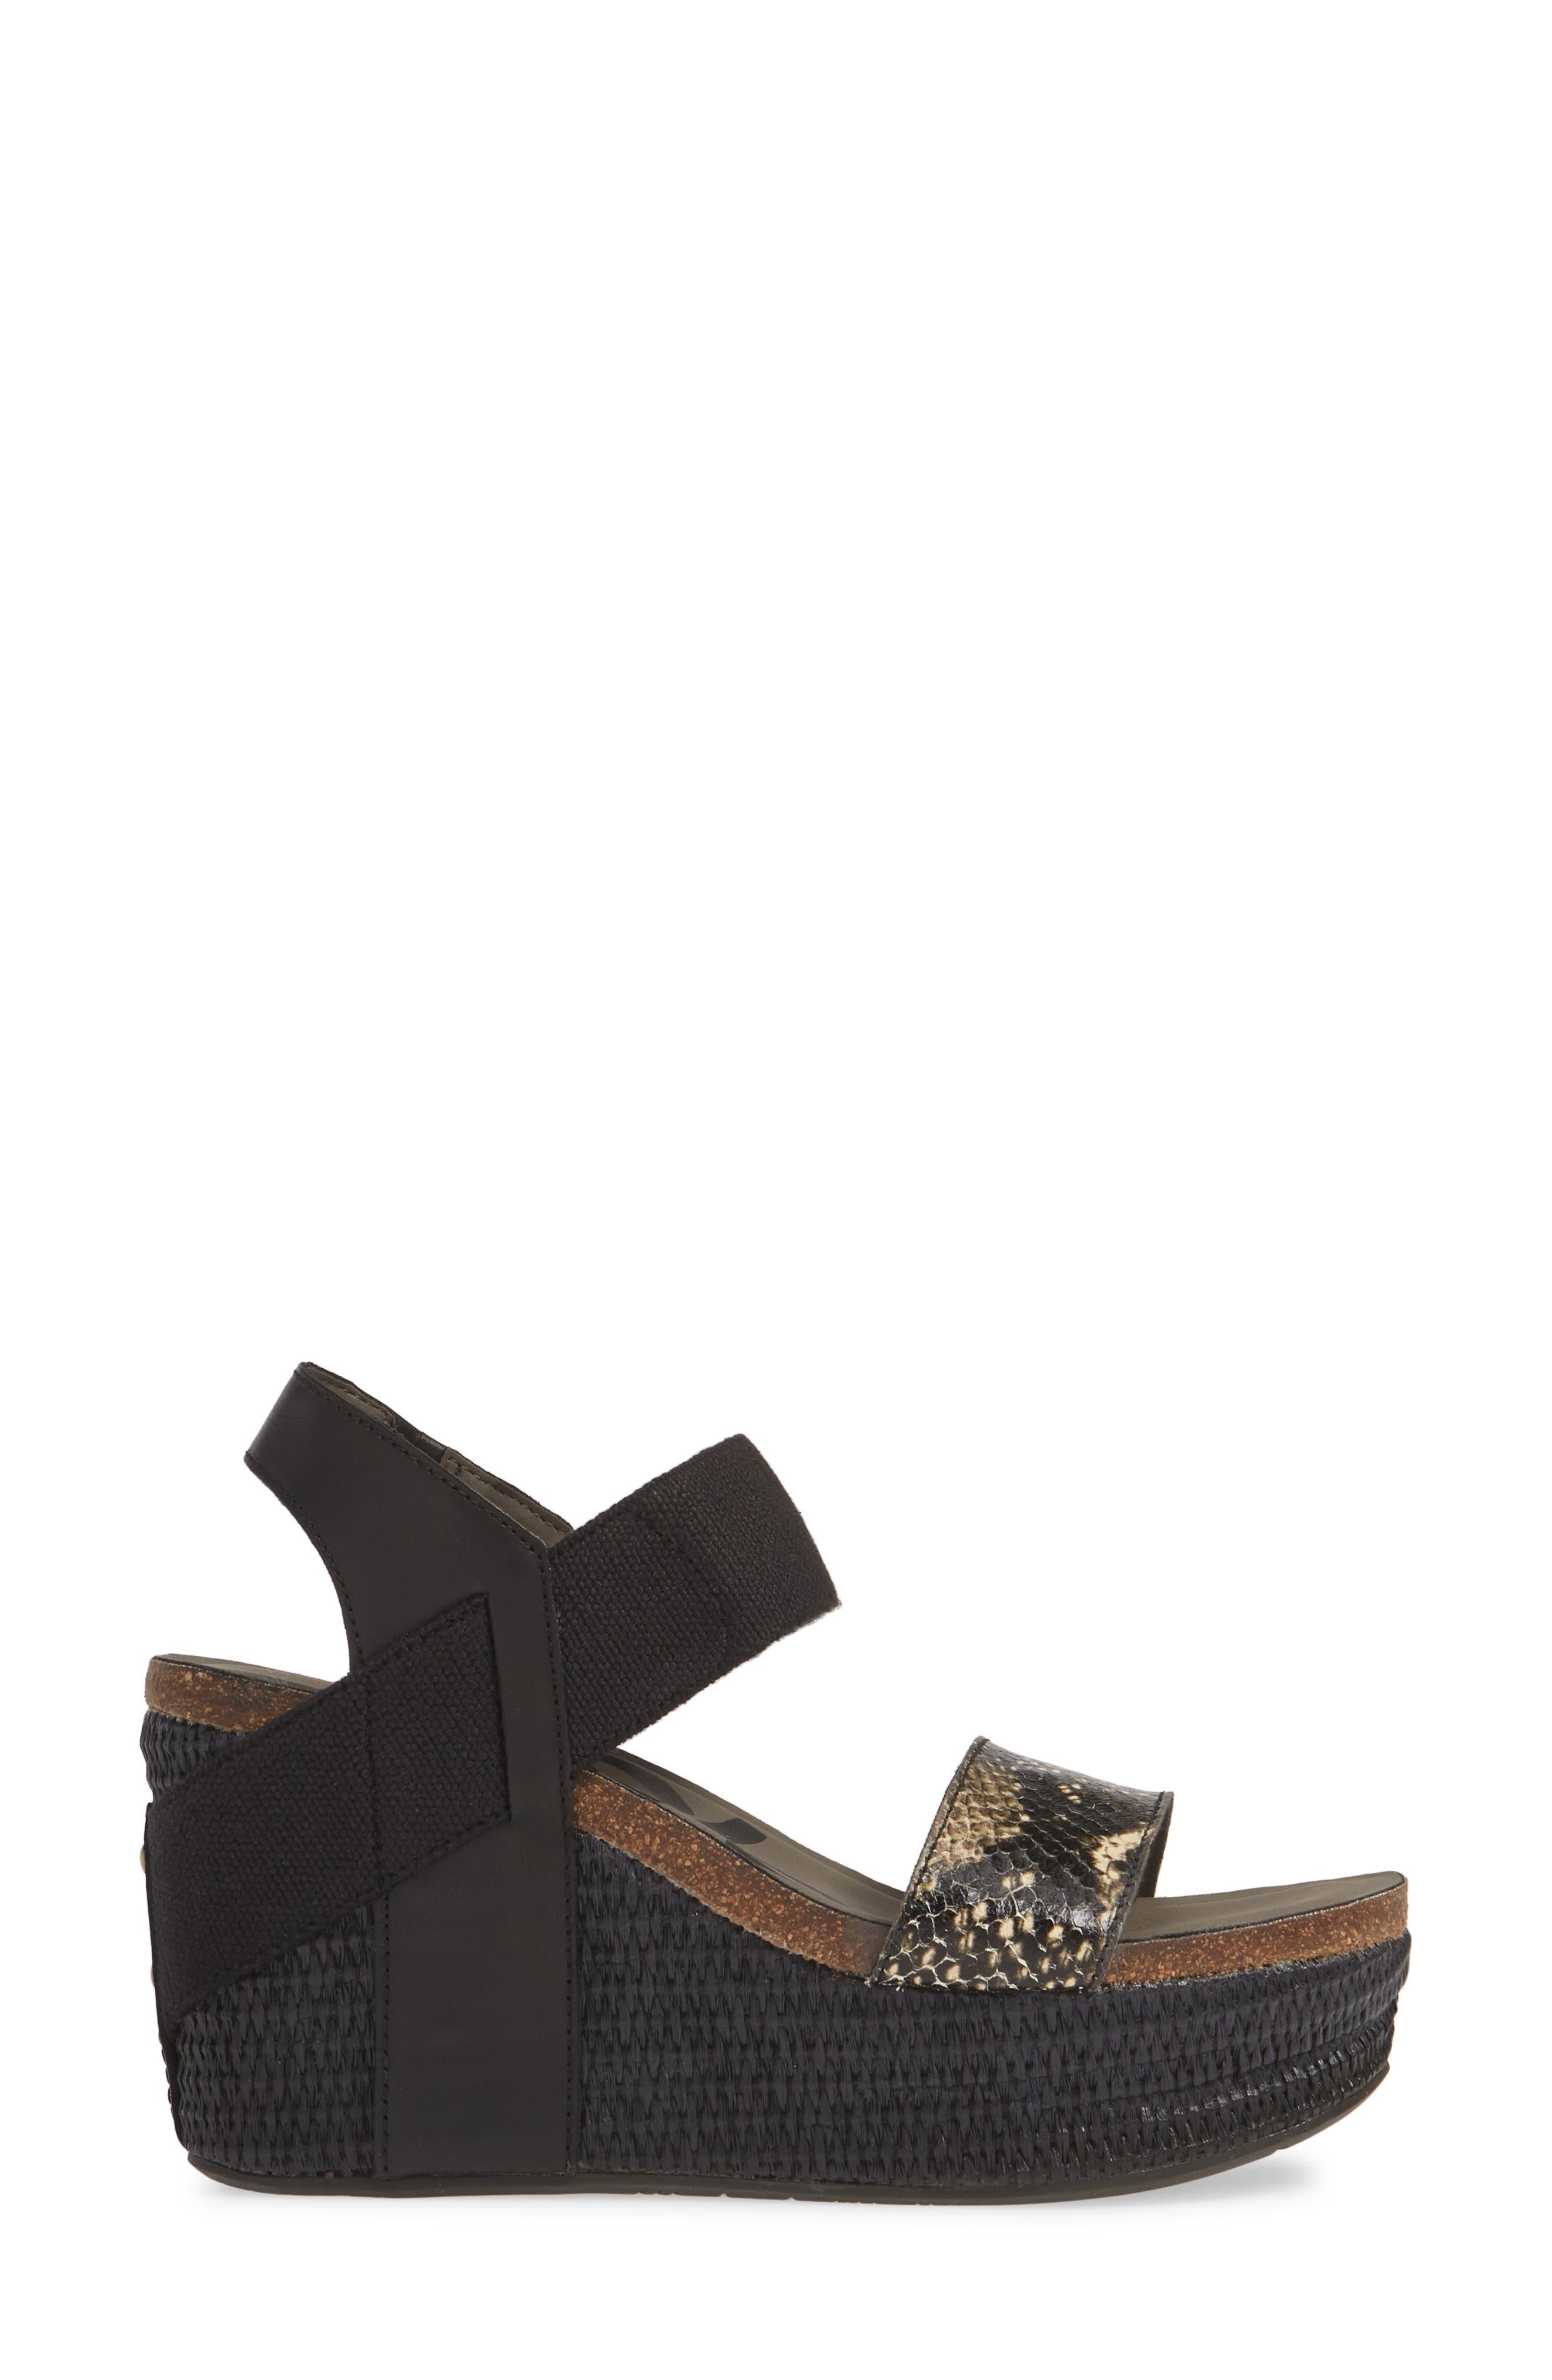 ,                             'Bushnell' Wedge Sandal,                             Alternate thumbnail 3, color,                             BLACK/ BLACK LEATHER